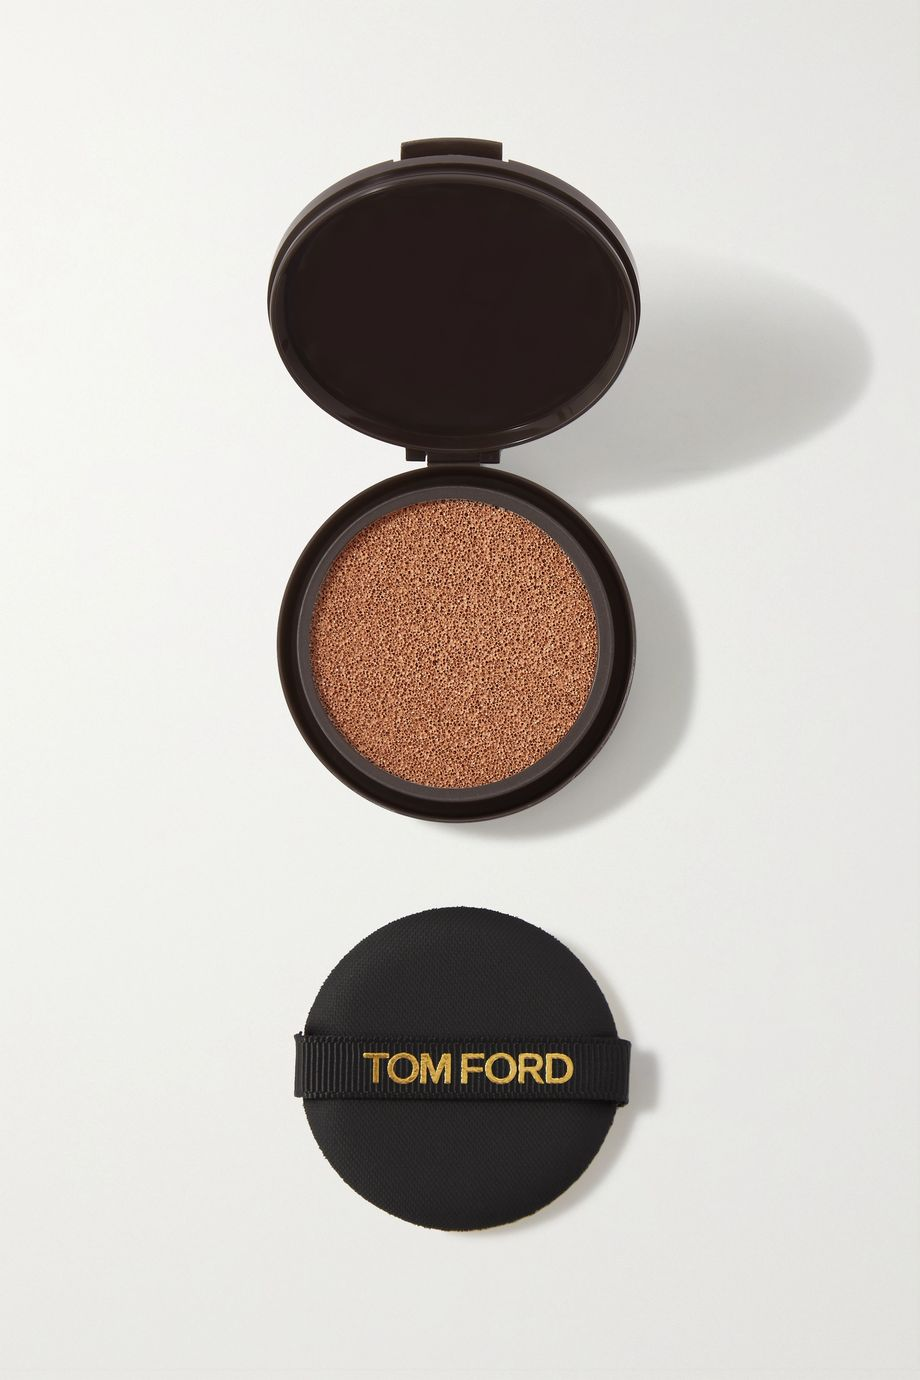 TOM FORD BEAUTY Traceless Touch Cushion Foundation Refill LSF 45 – 6.0 Natural, 12 g – Foundation zum Nachfüllen